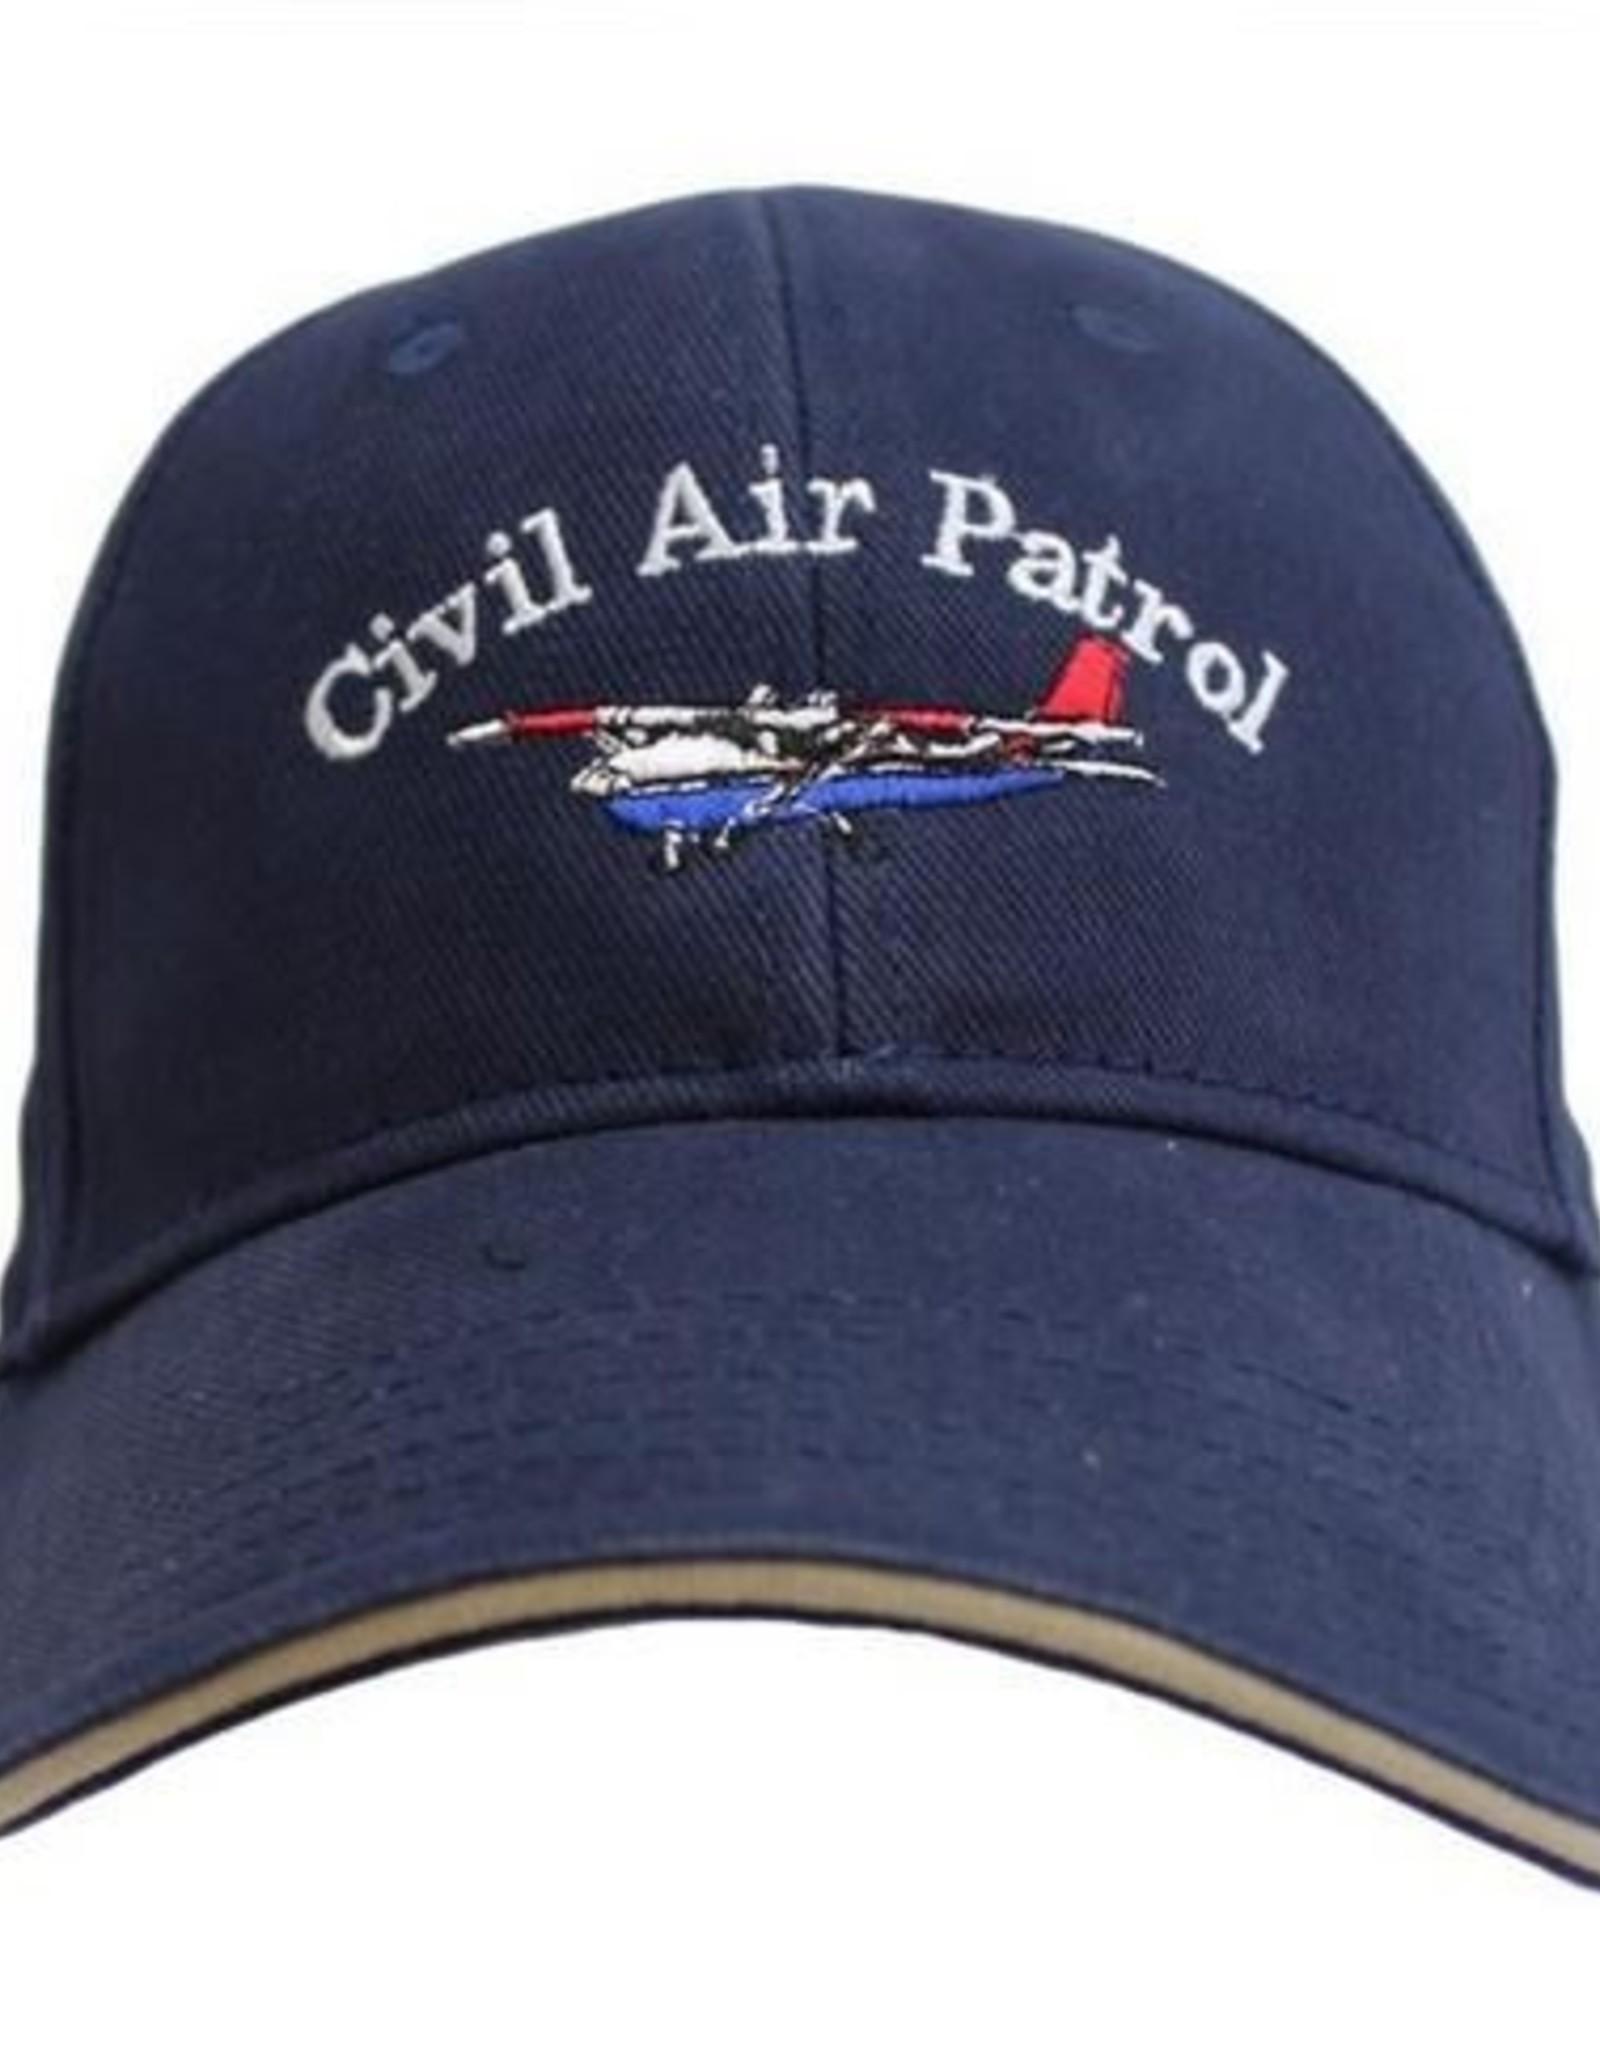 MidMil Civil Air Patrol Hat with Cessna Dark Blue